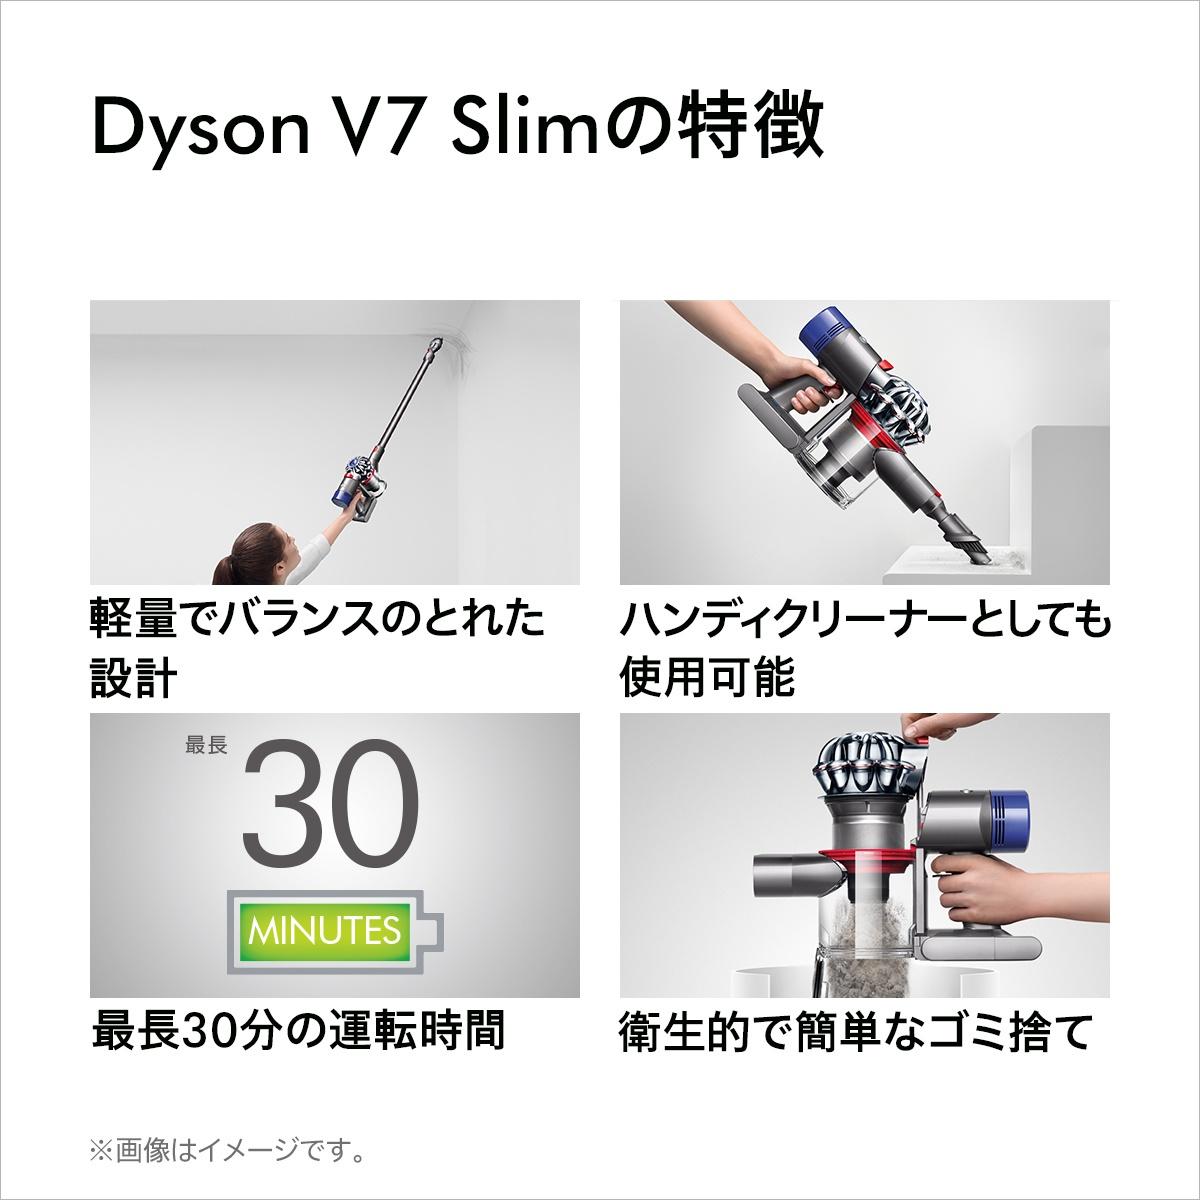 Dyson(ダイソン) V7 Slimの商品画像2